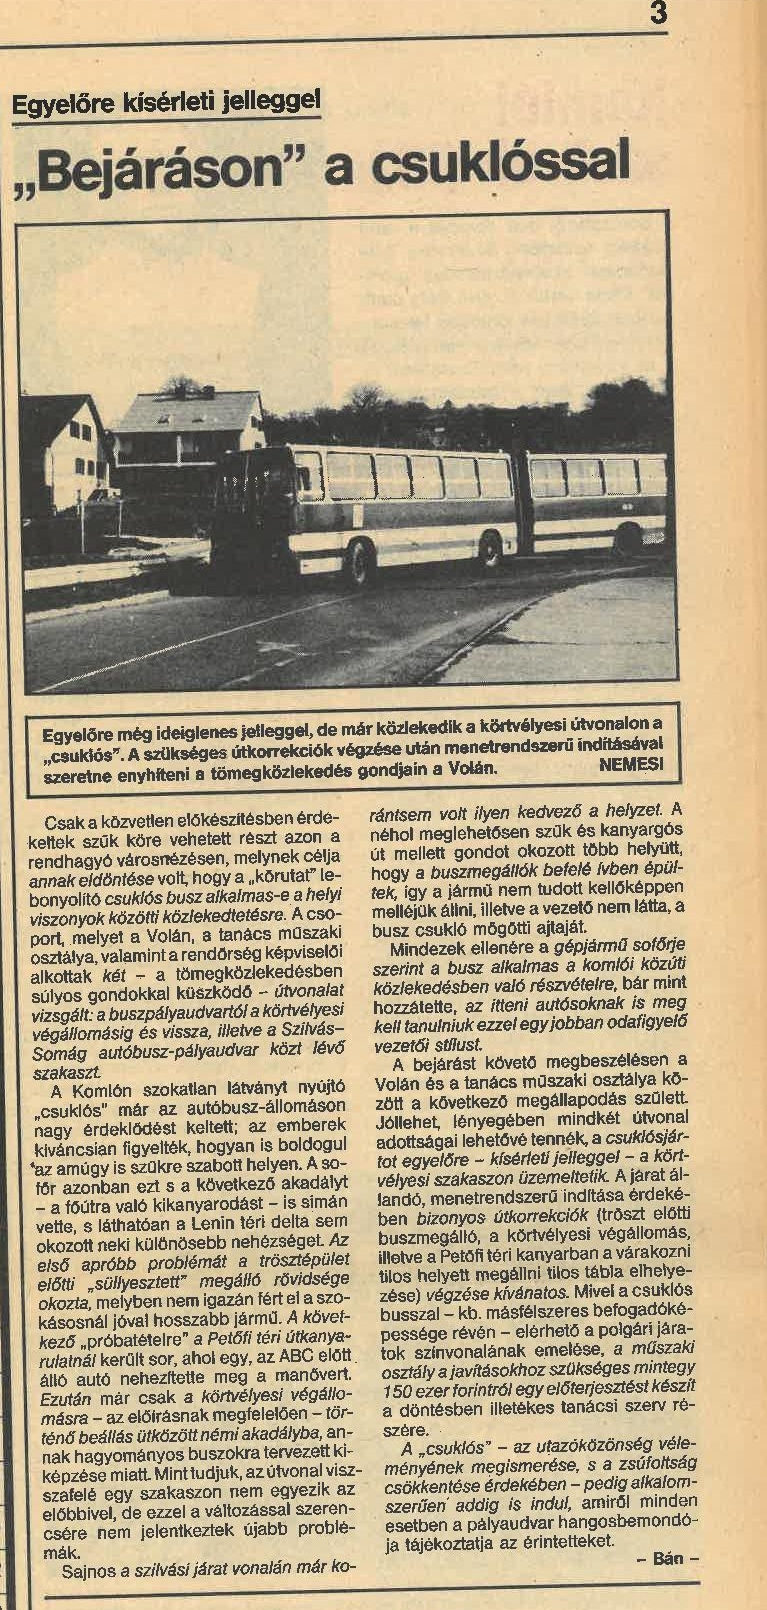 komloi_ujsag_1990_aprilis_28_3_o.jpg